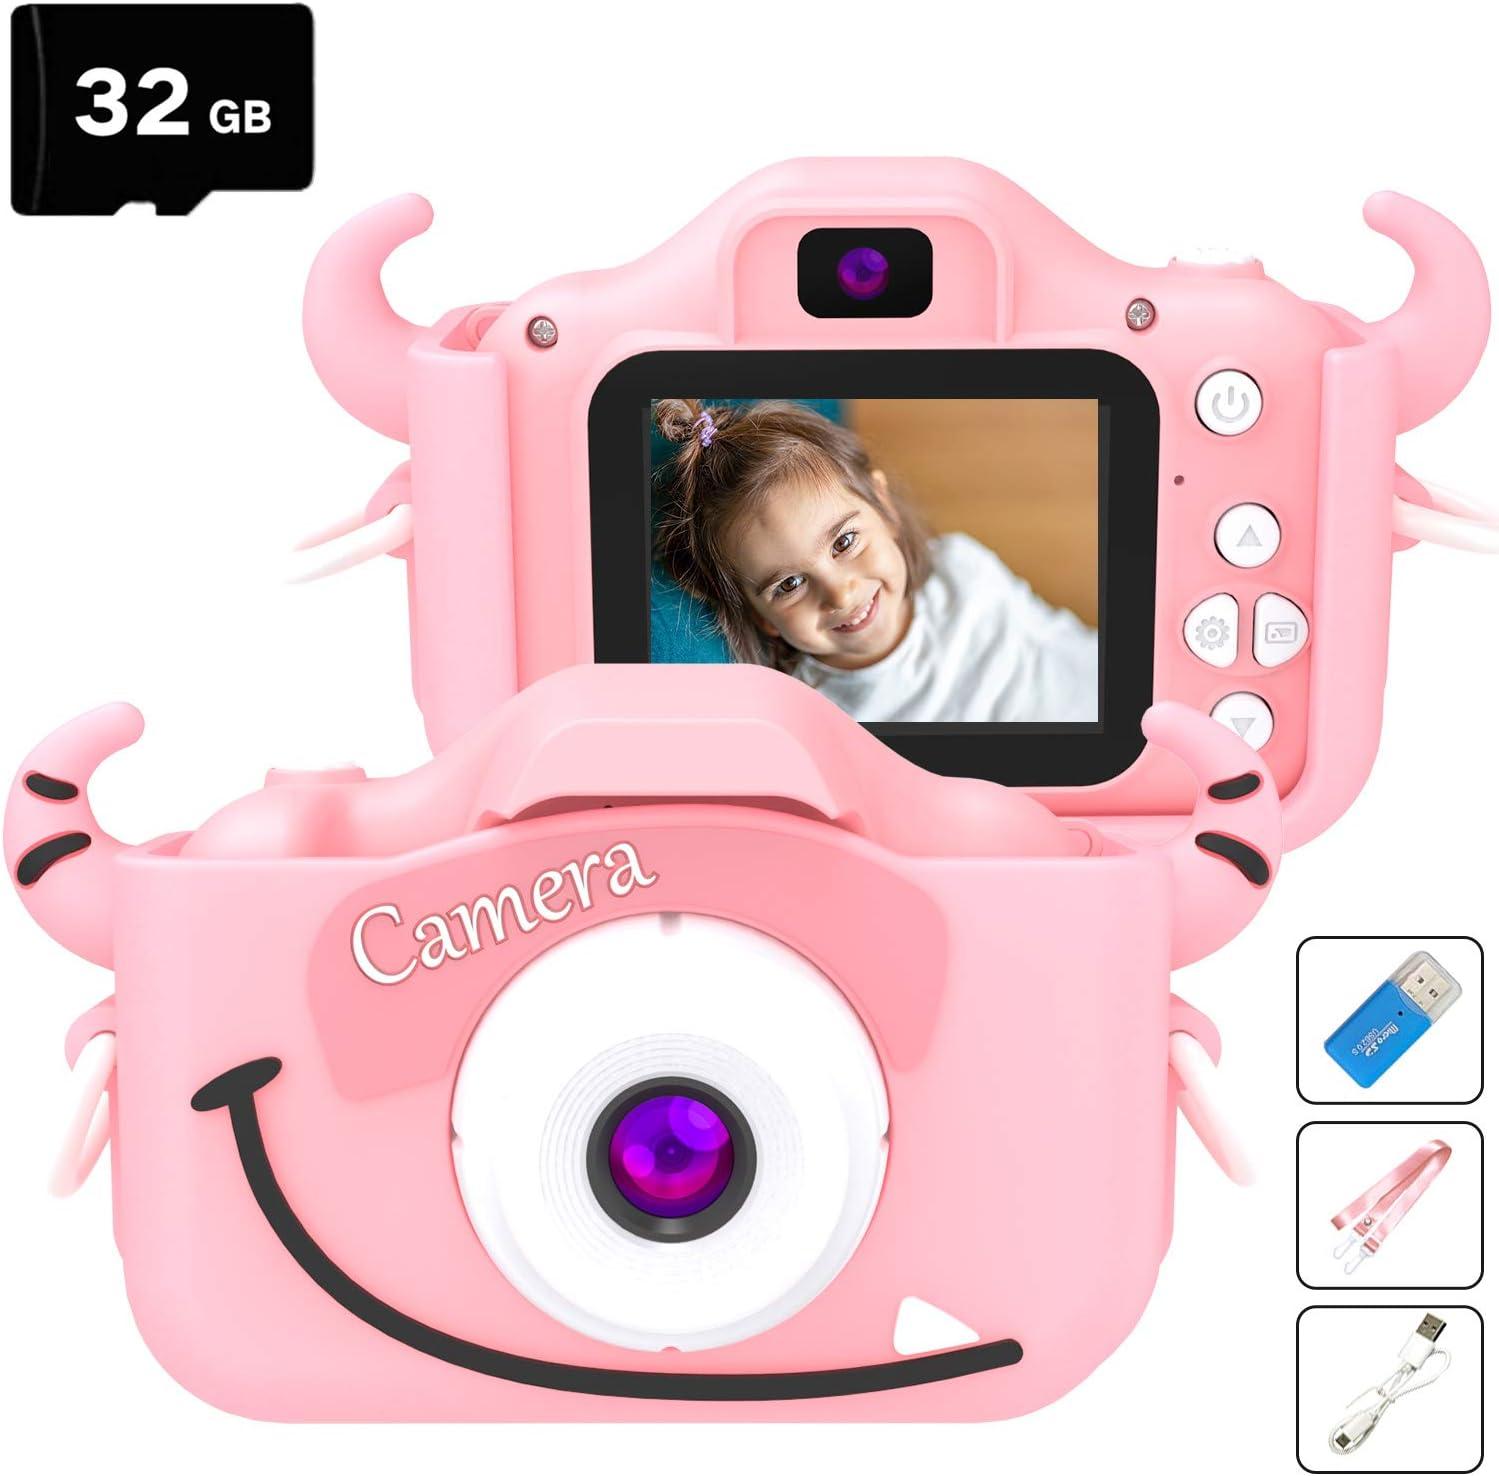 Mini Digital Camera Cartoon Camera Kids Toy Mini Camera with Double Port Gift for Kids Pink